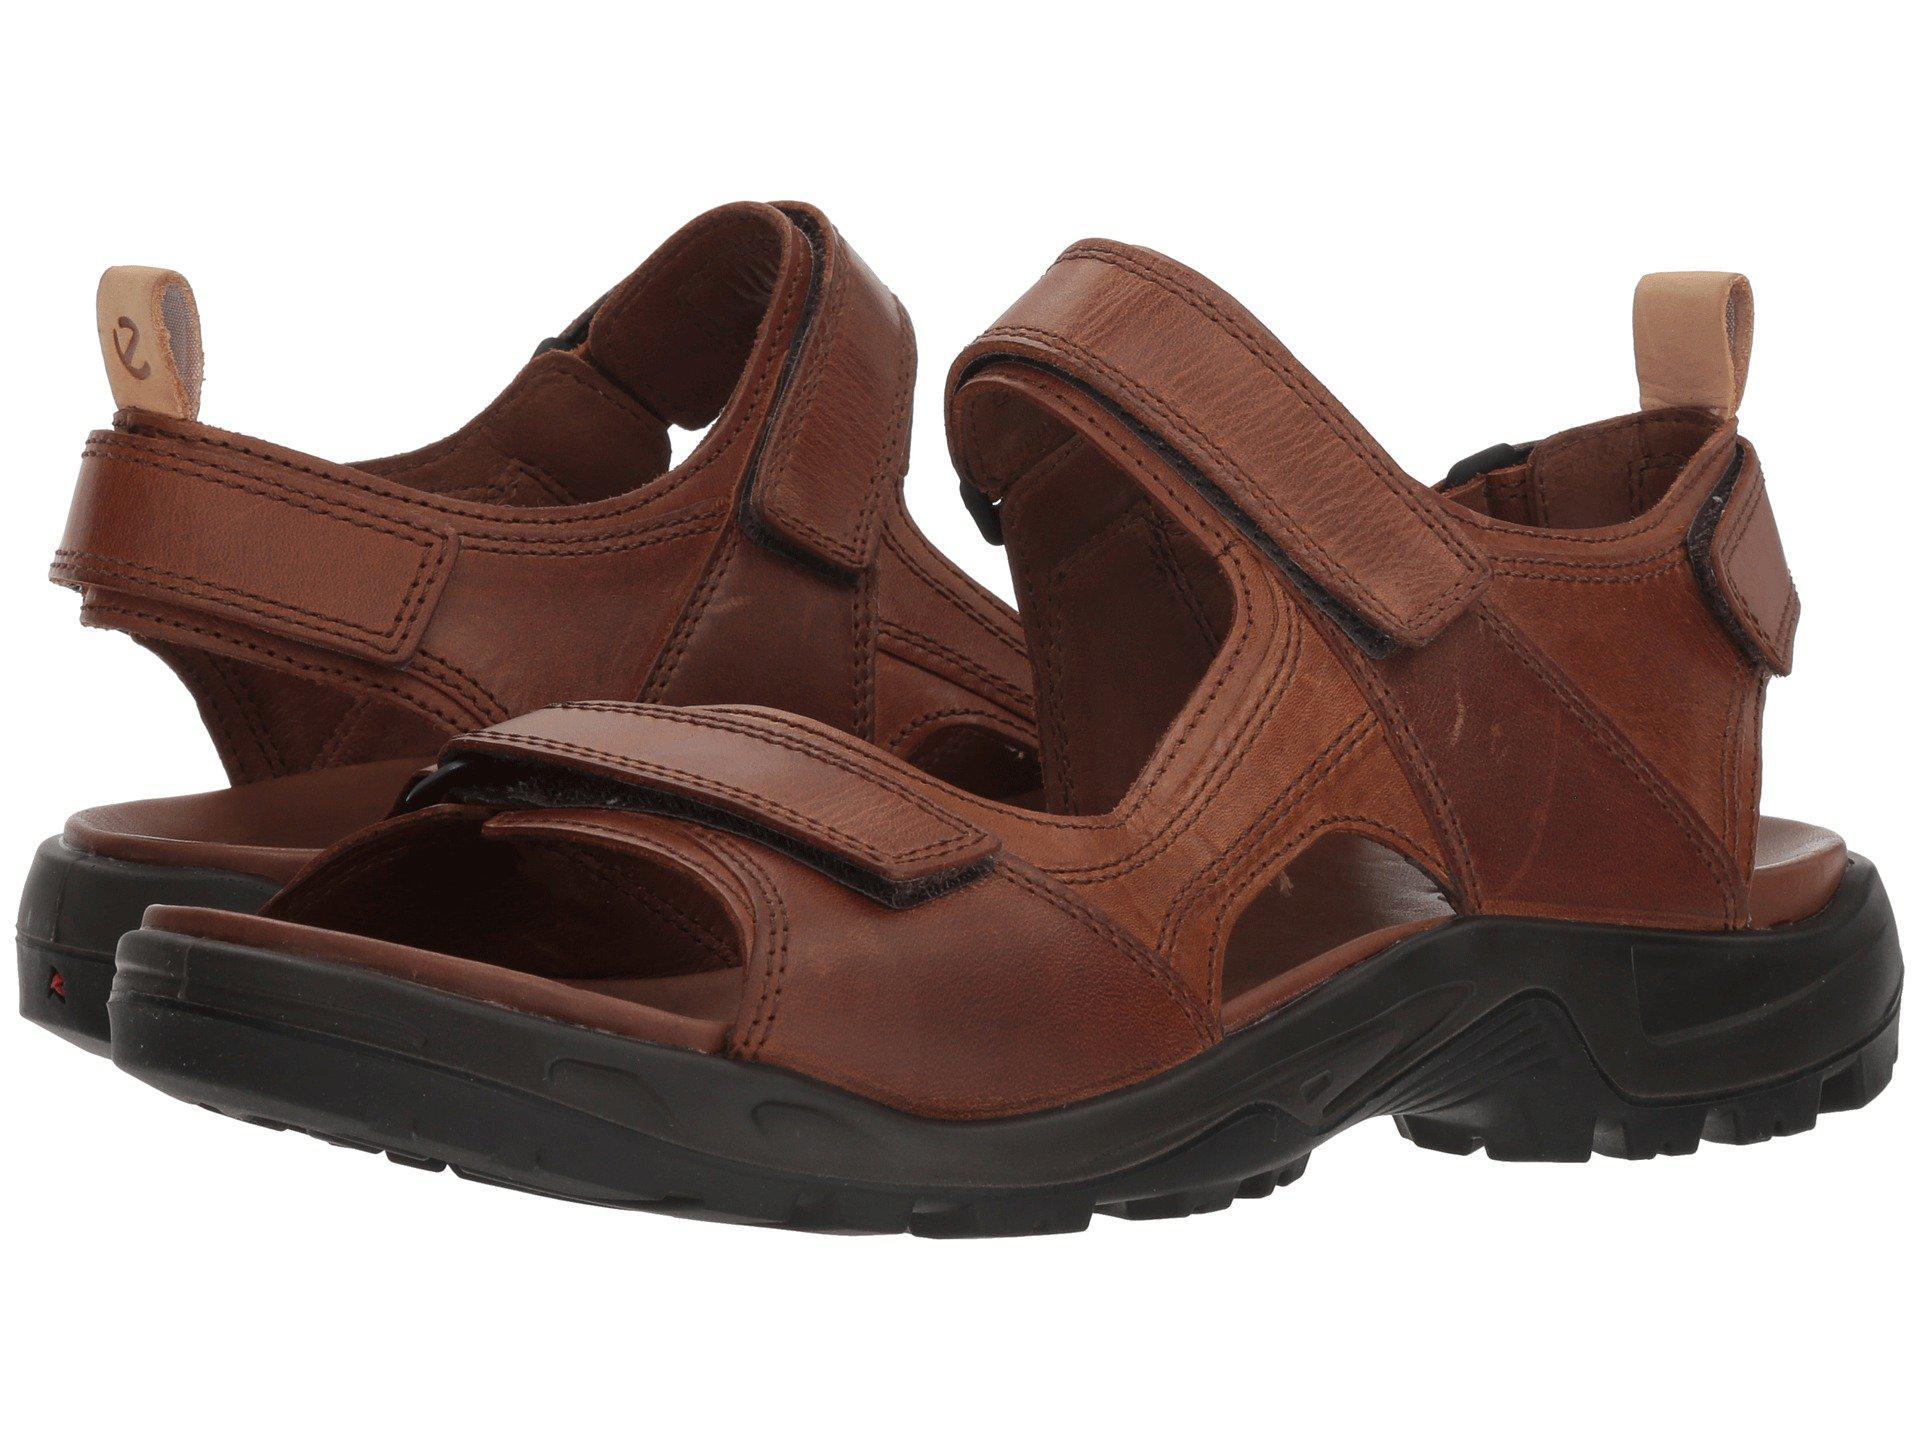 531cfa844ff Ecco Offroad 2.0 Sandal (black/powder) Men's Sandals in Brown for ...